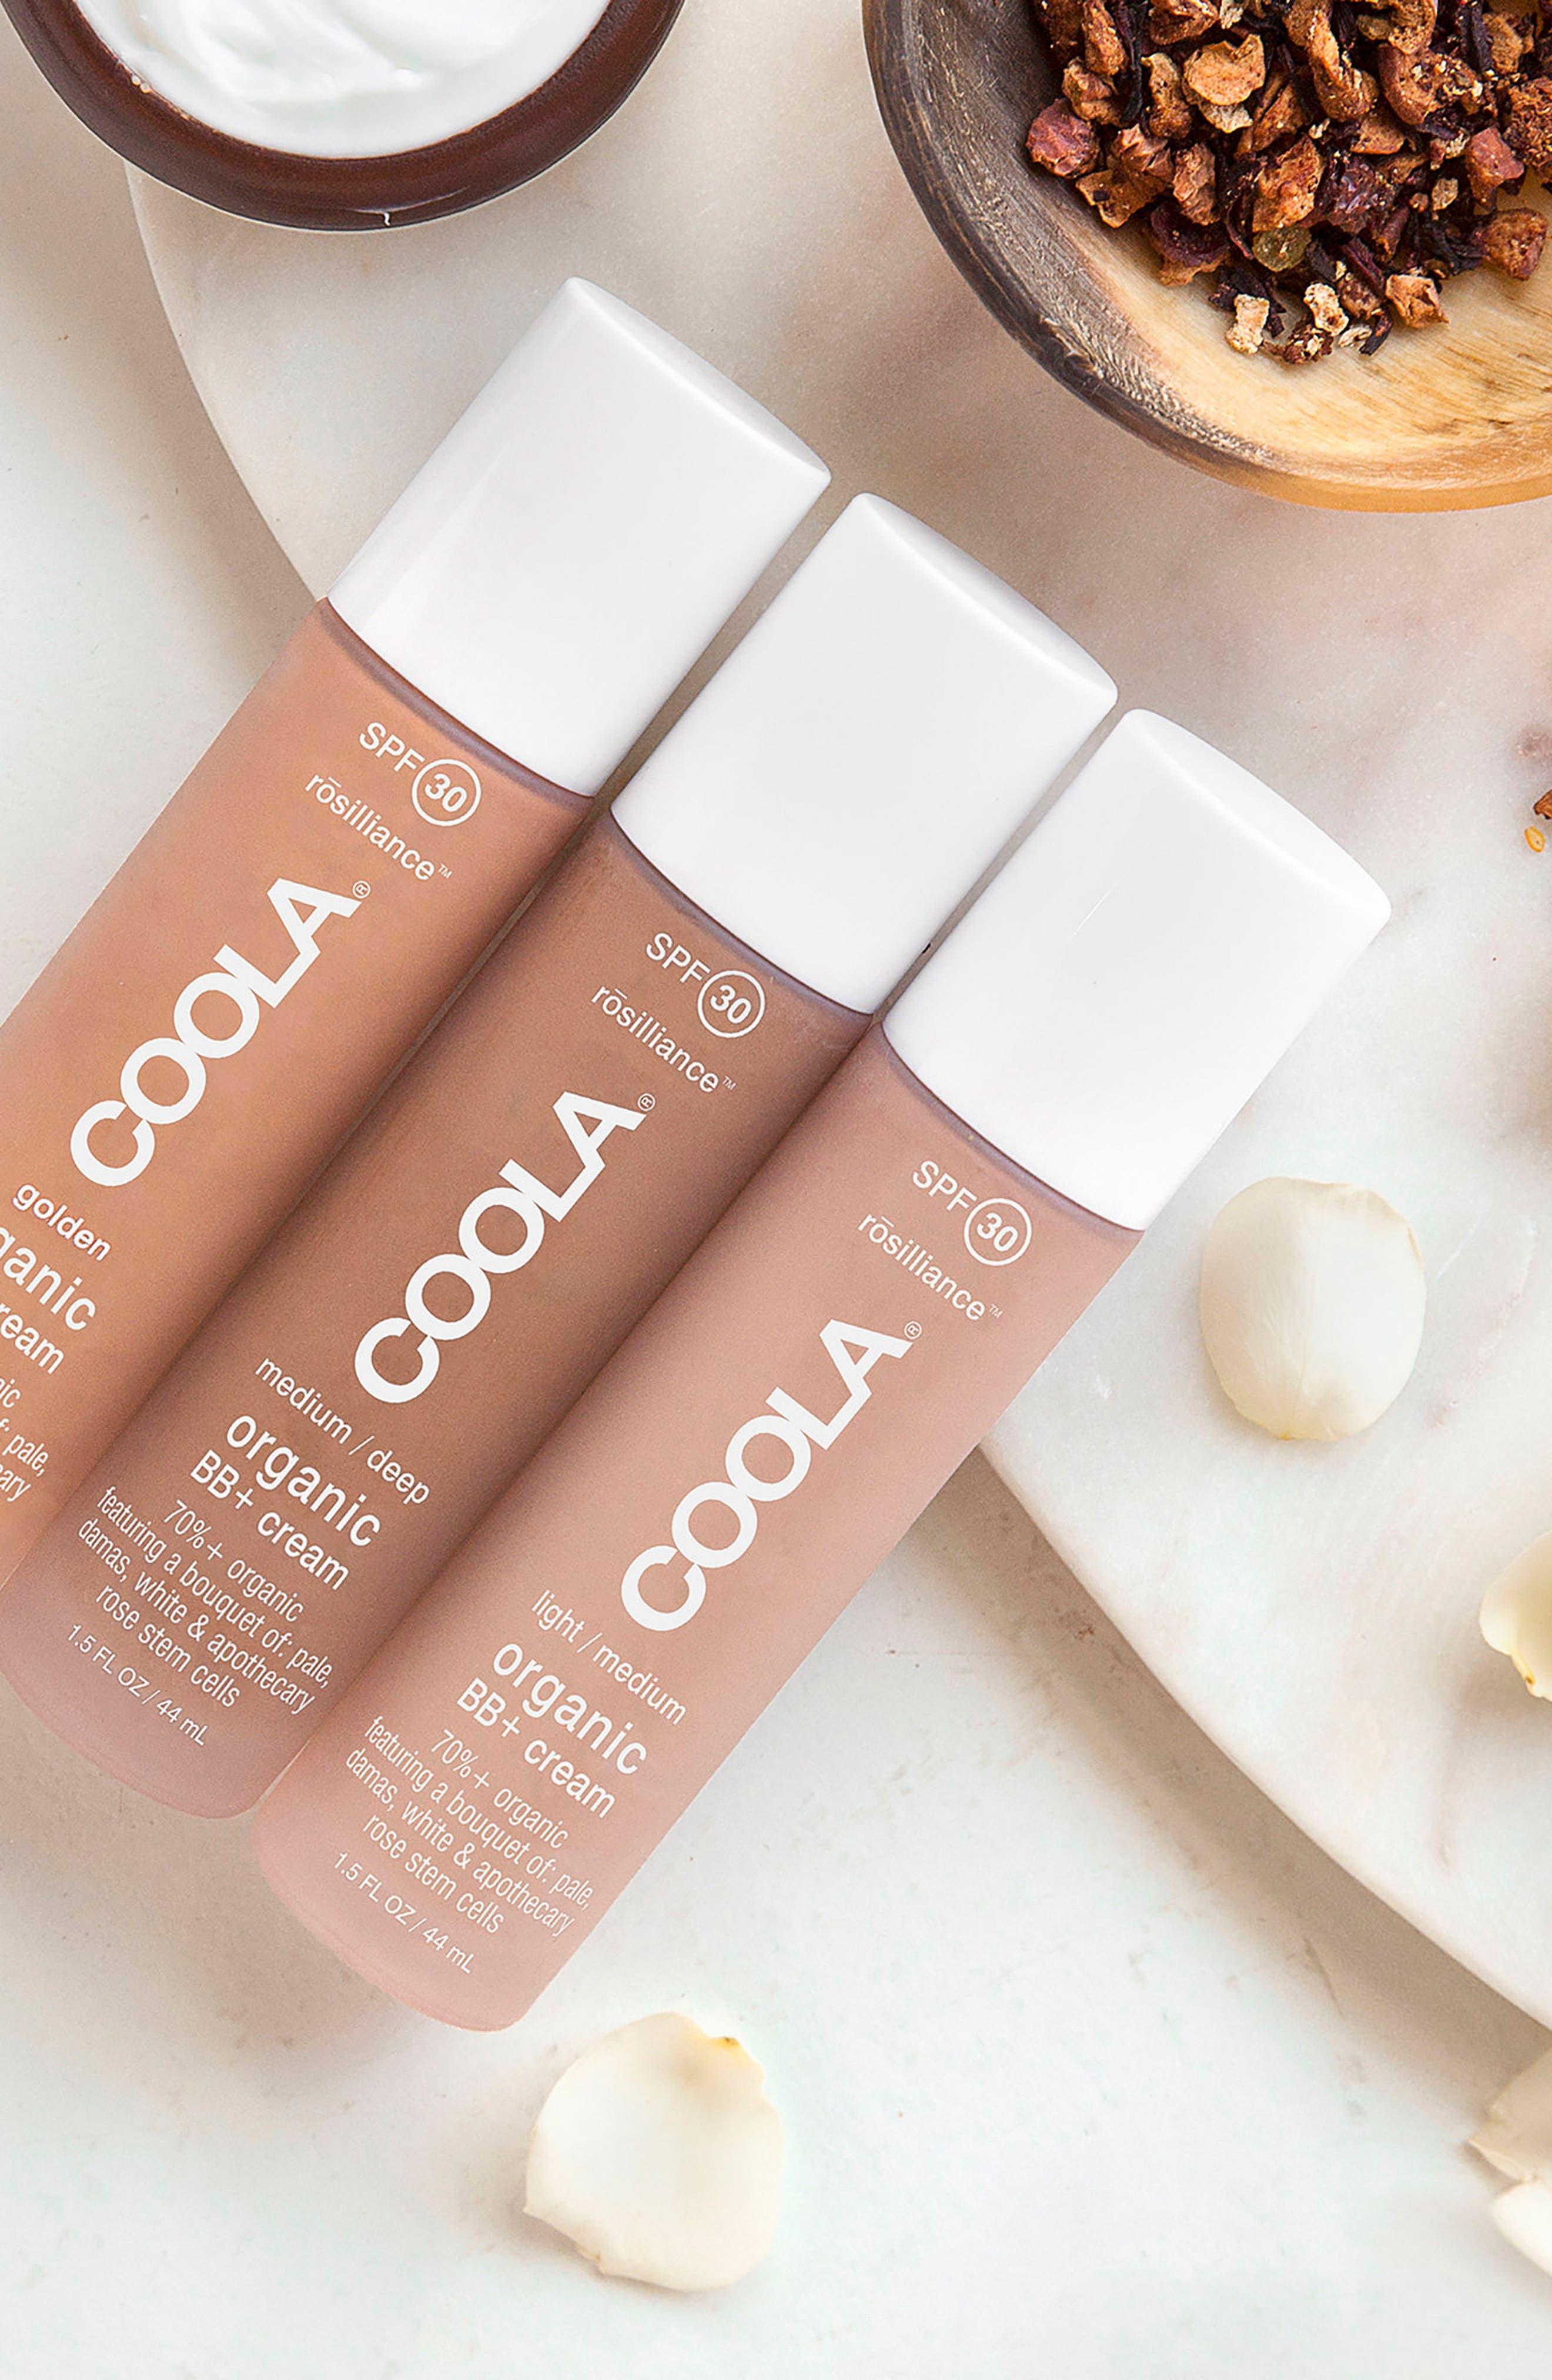 COOLA<sup>®</sup> Suncare rosilliance<sup>™</sup> Mineral BB+ Cream SPF 30,                             Alternate thumbnail 2, color,                             LIGHT MEDIUM